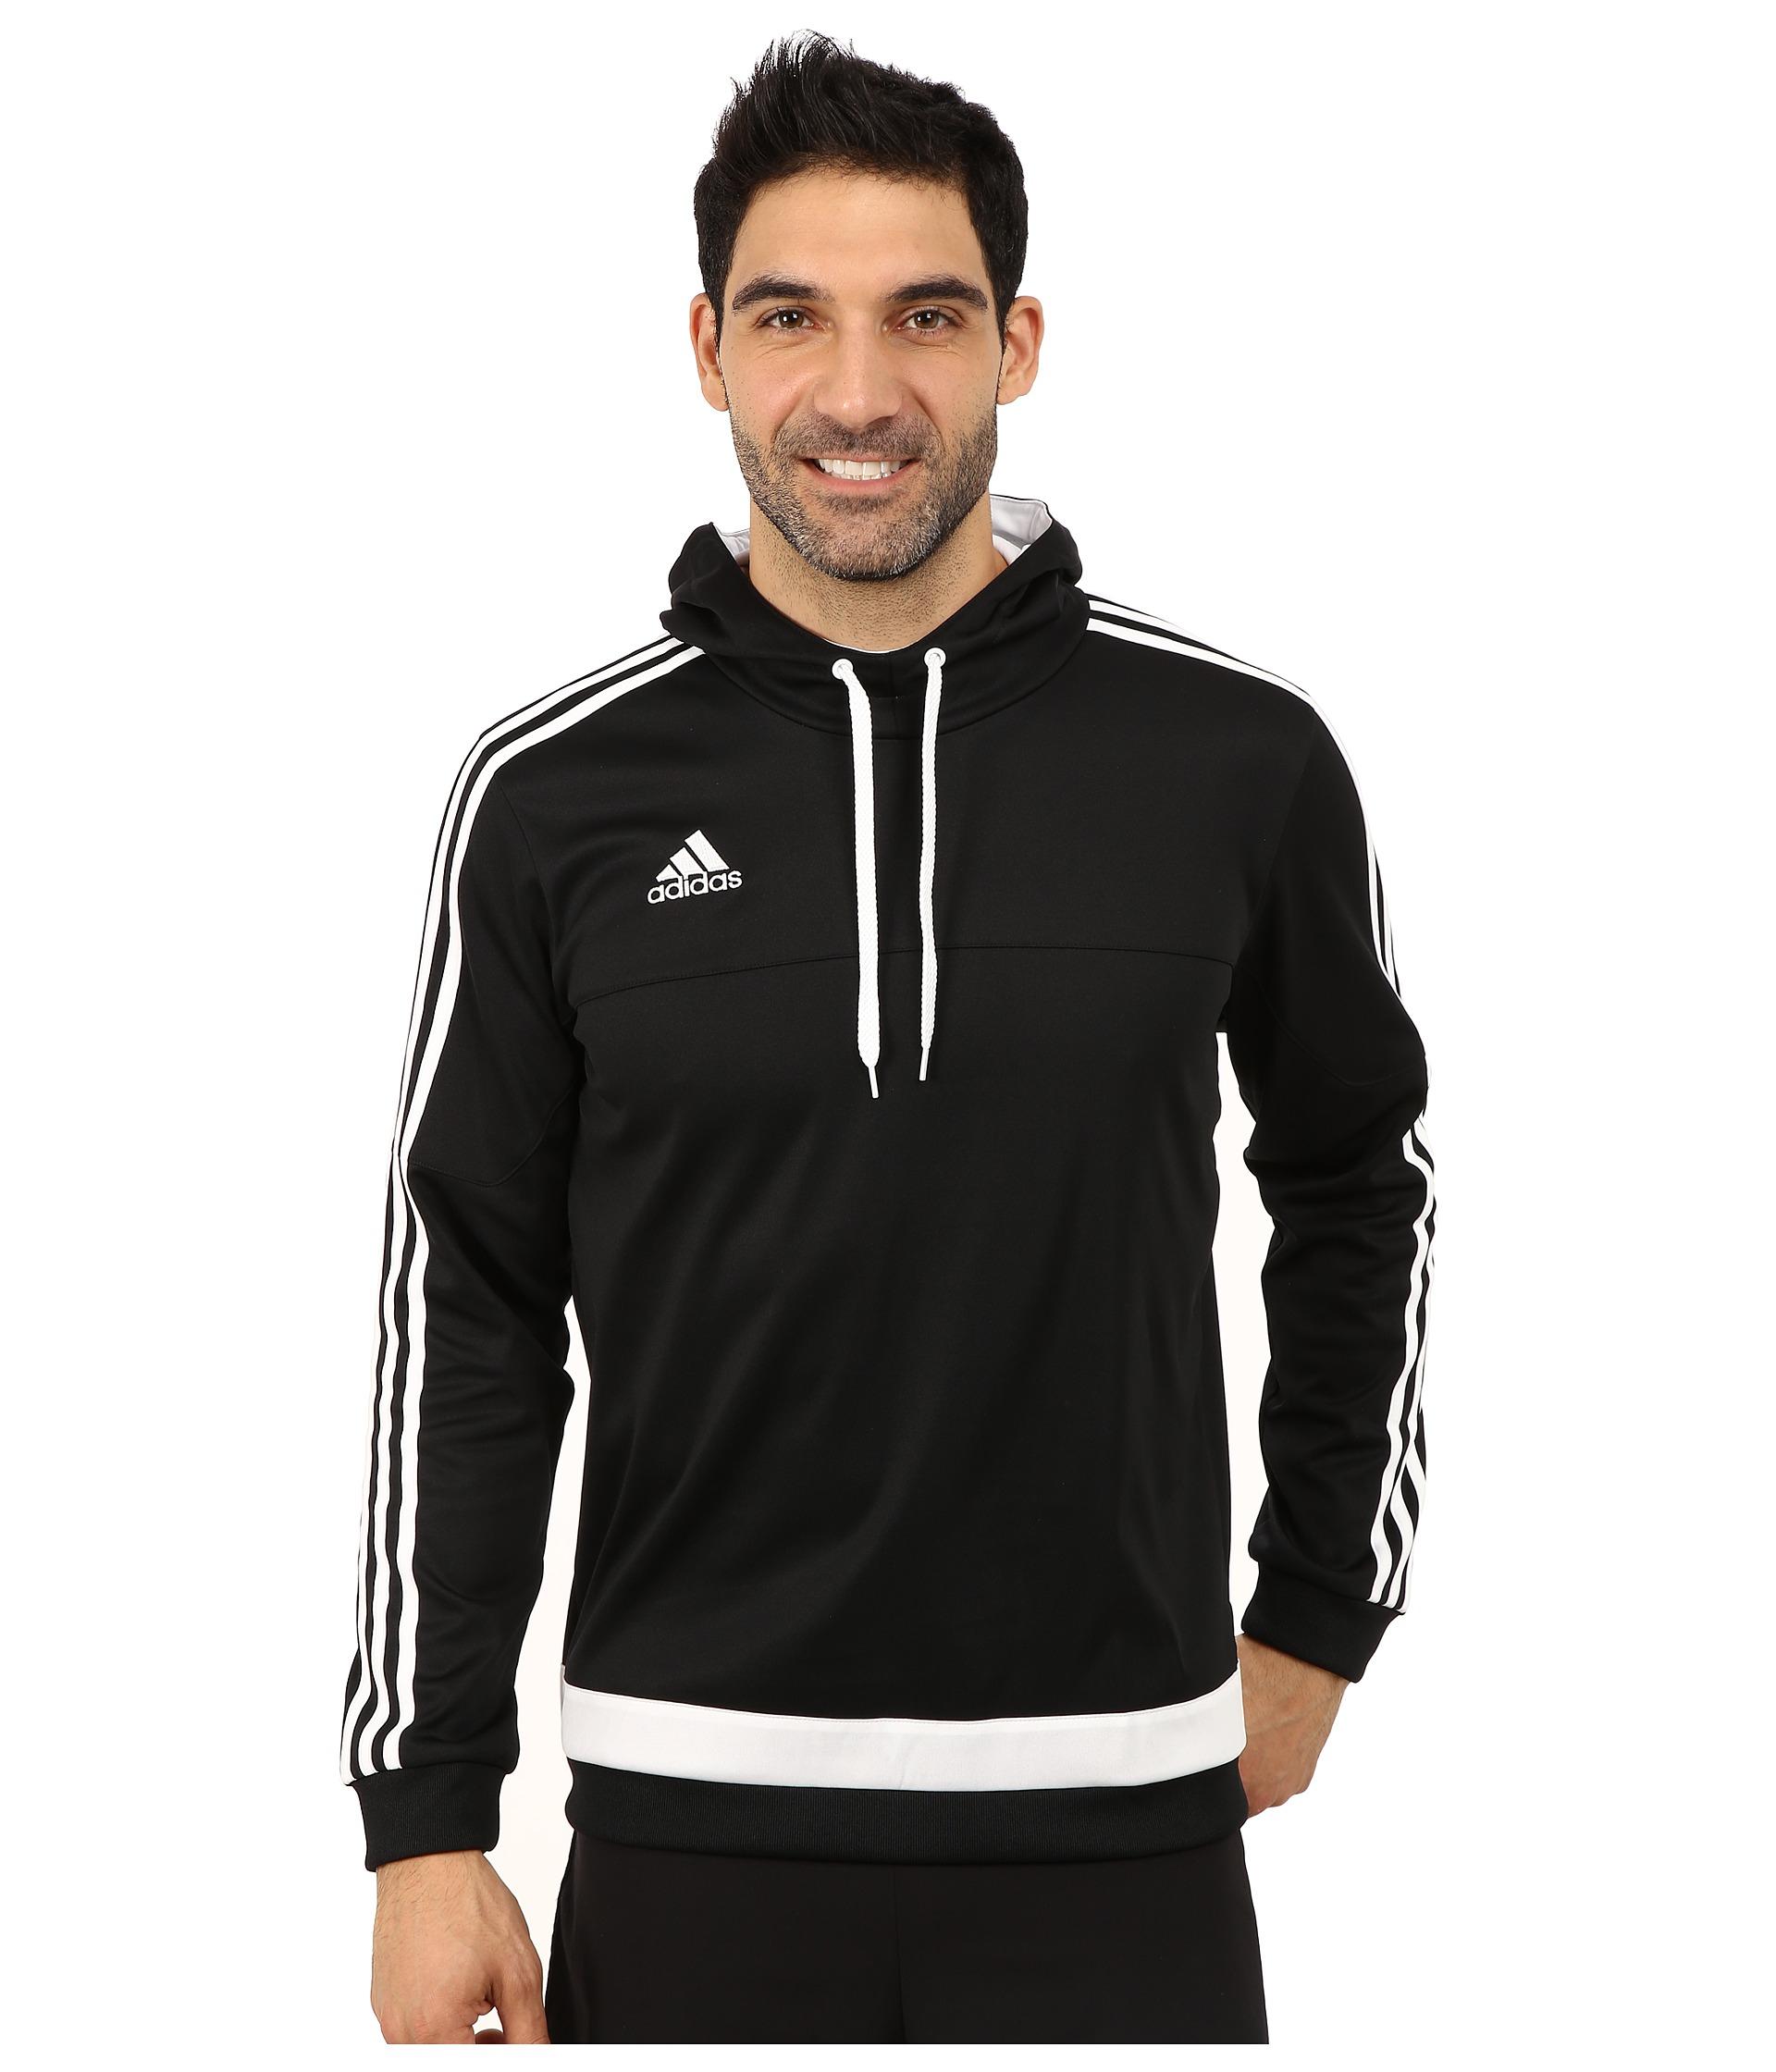 Lyst Adidas tiro 15 en negro para Hombres sudadera con capucha